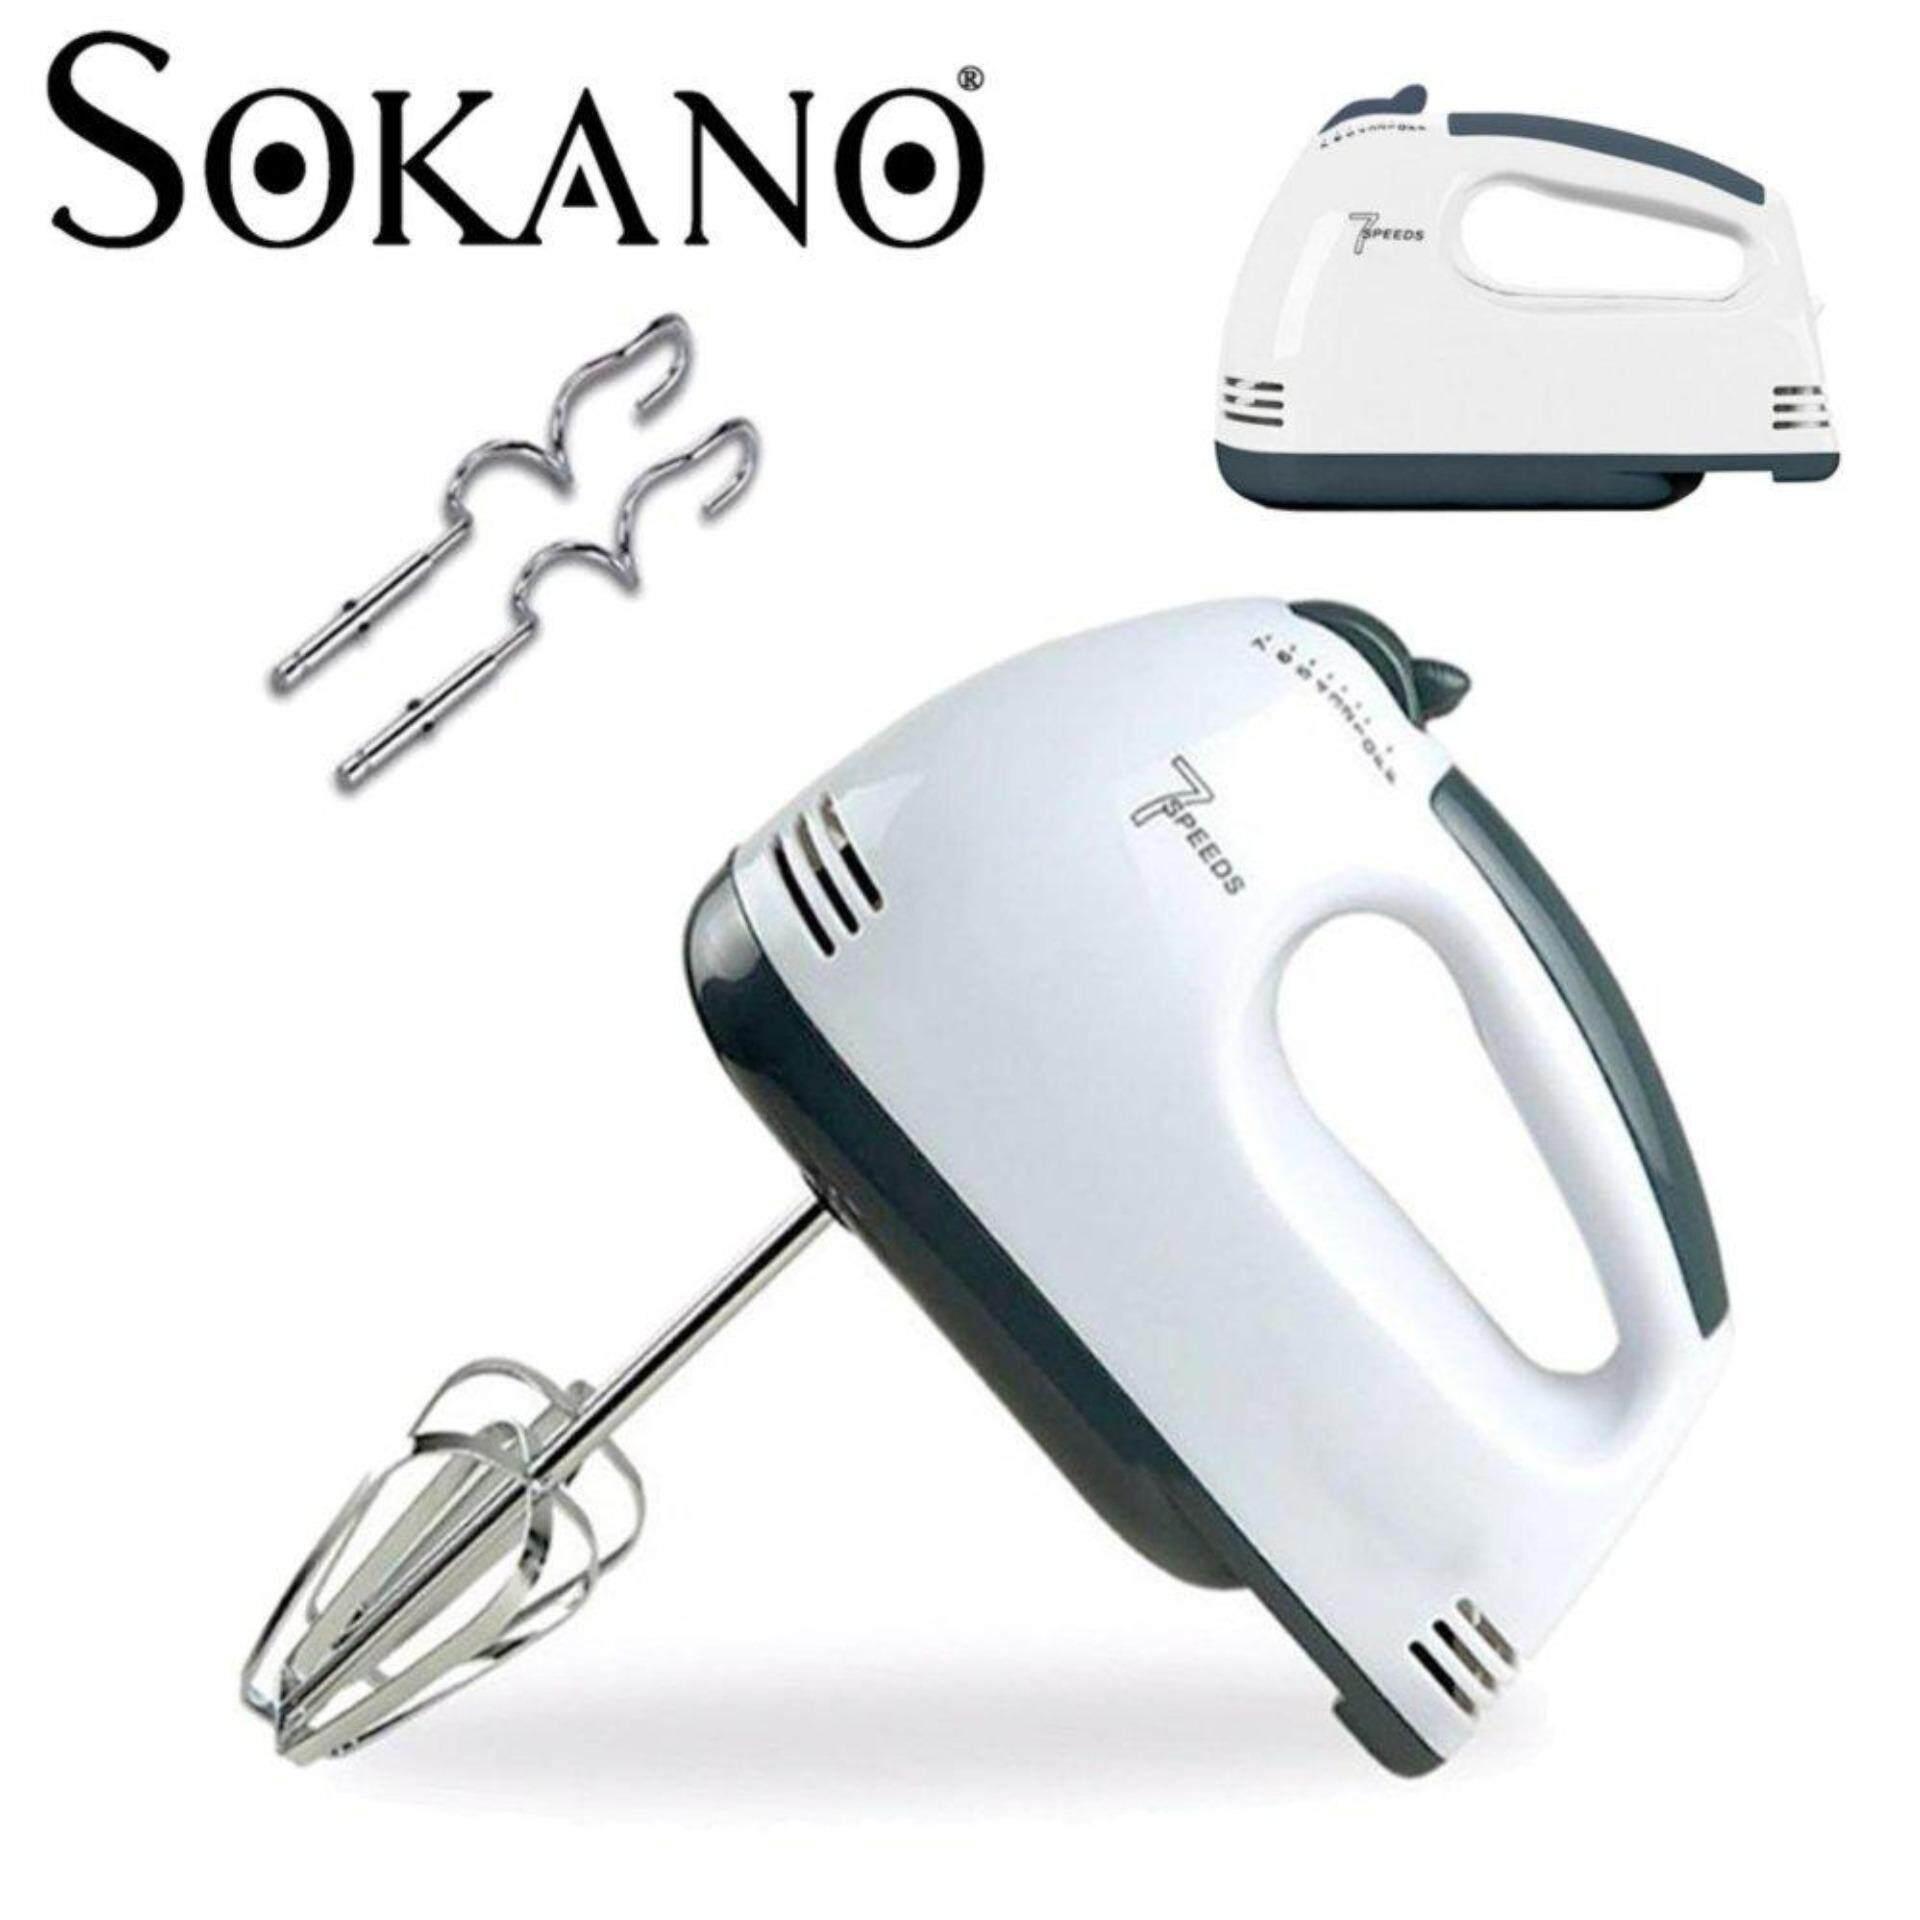 SOKANO 7 Speed Portable Baking Hand Mixer